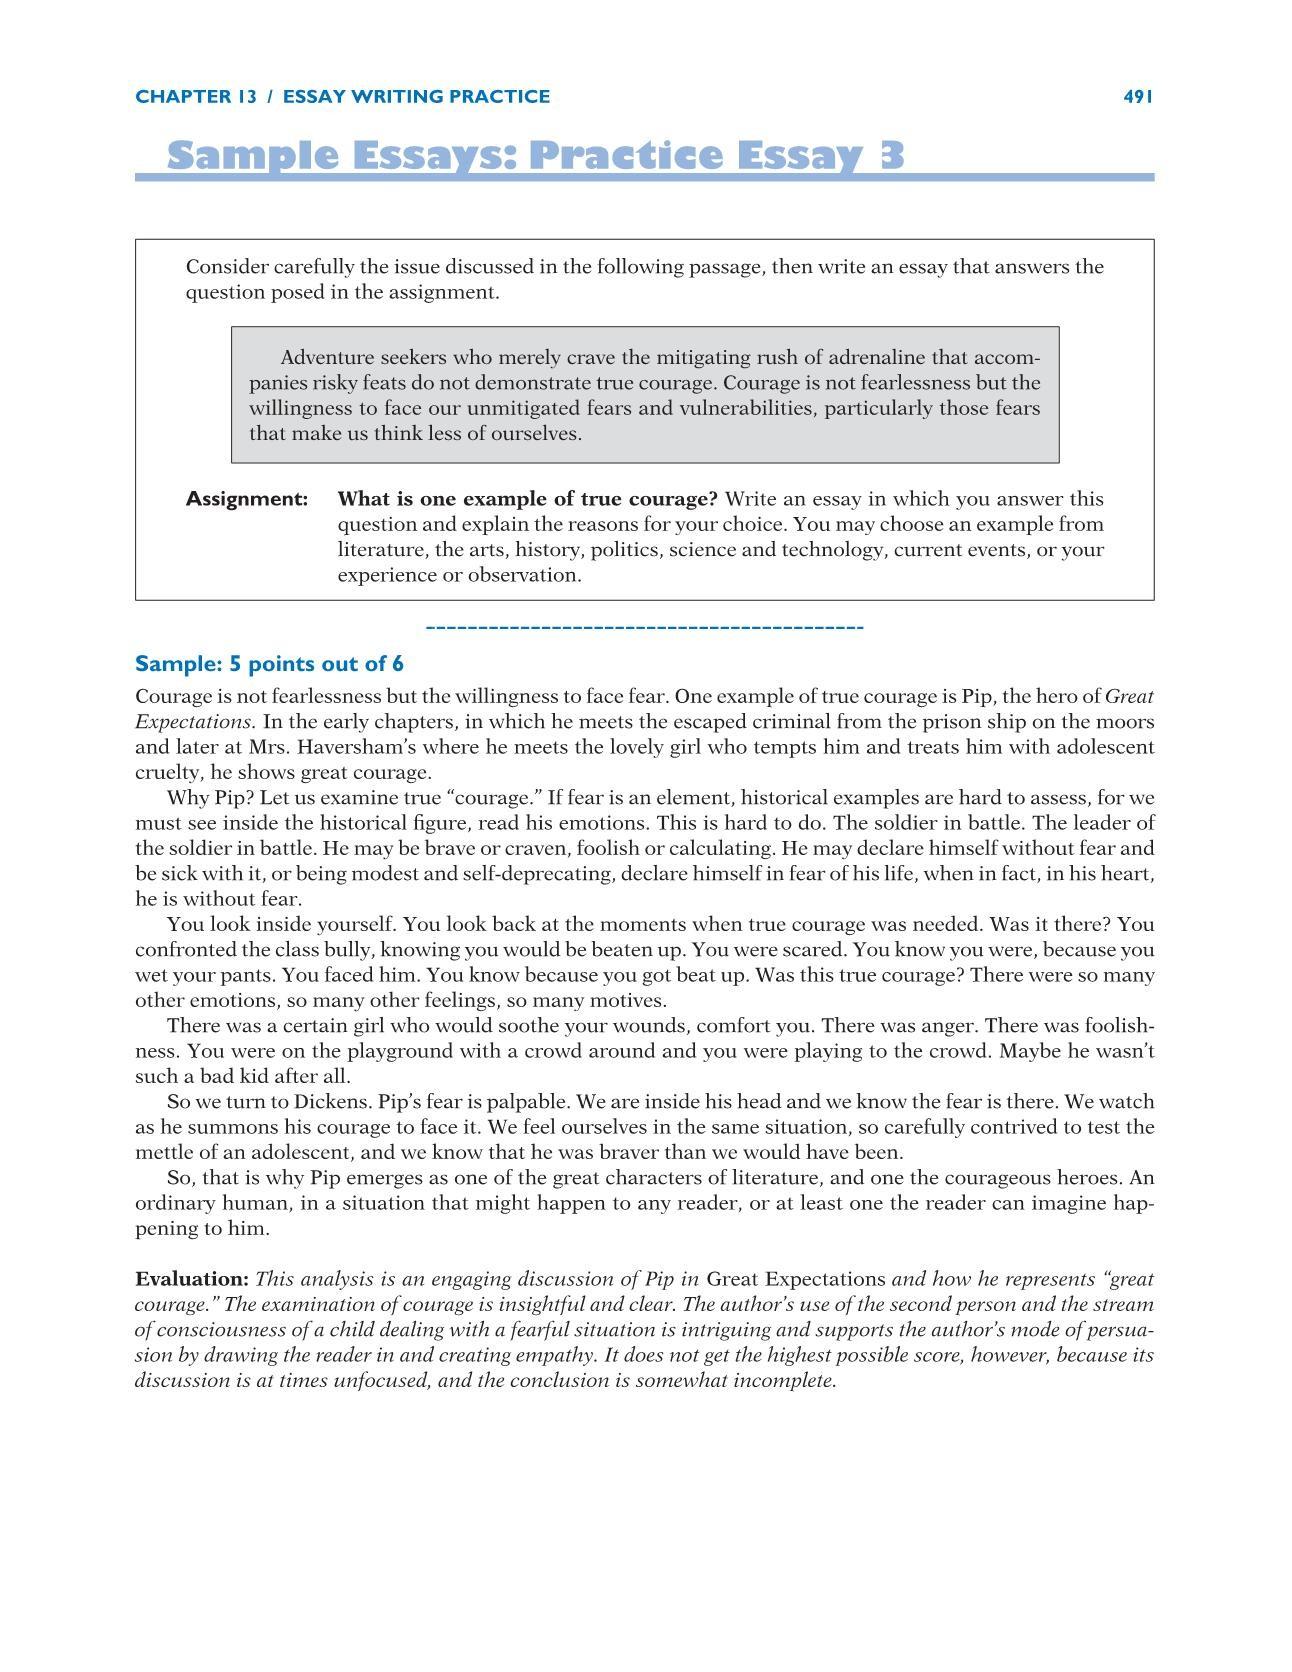 010 New Sat Essays Striking Essay Examples Perfect Score Good Prompts Full